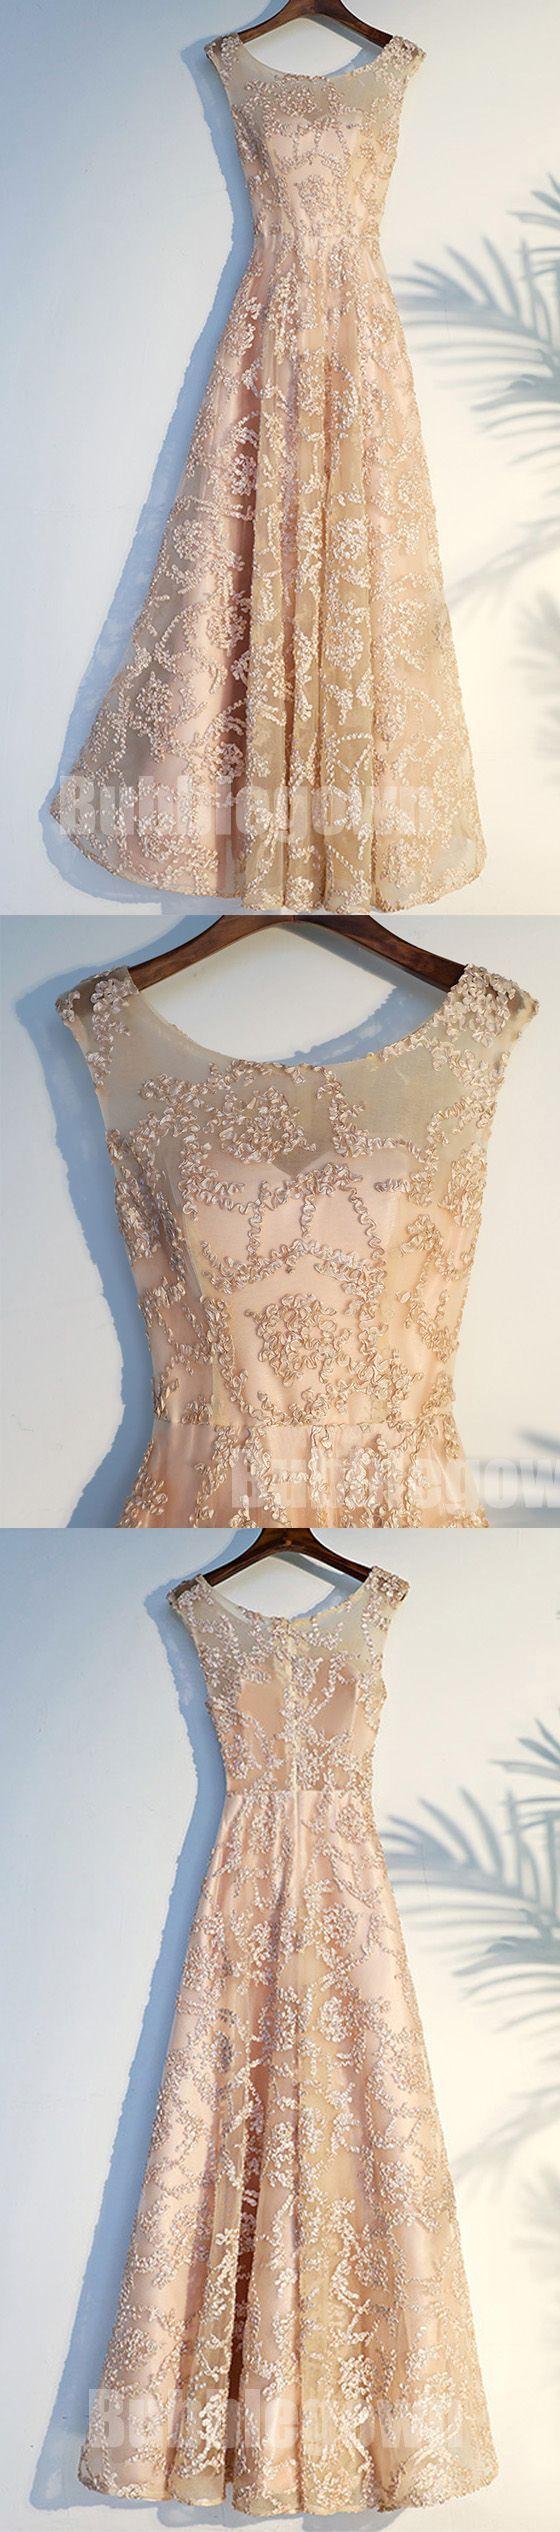 Unique New Arrival Formal Cheap Elegant Online Long Prom Dresses, BGP025 #promdress #promdresses